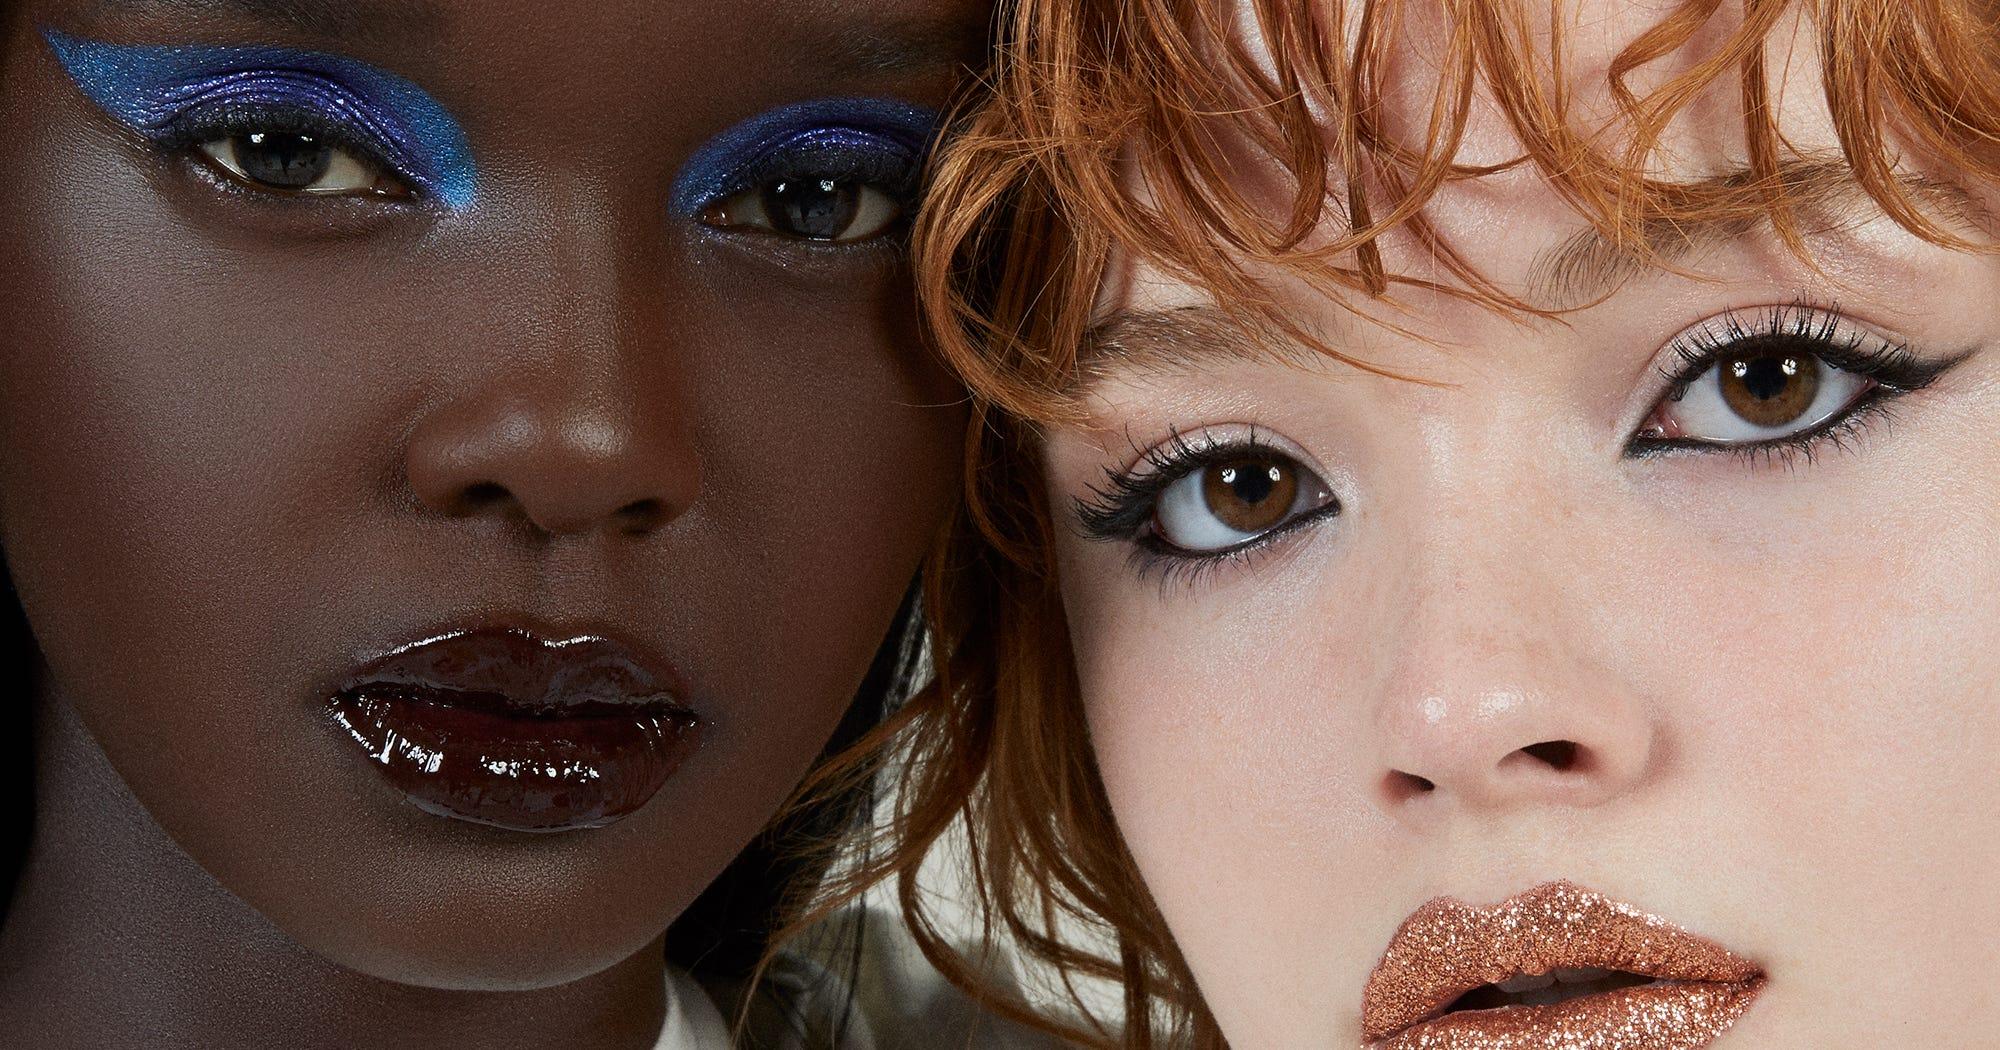 Pat Mcgrath Skin Fetish Lust Makeup Looks Day To Night - Everyday-makeup-looks